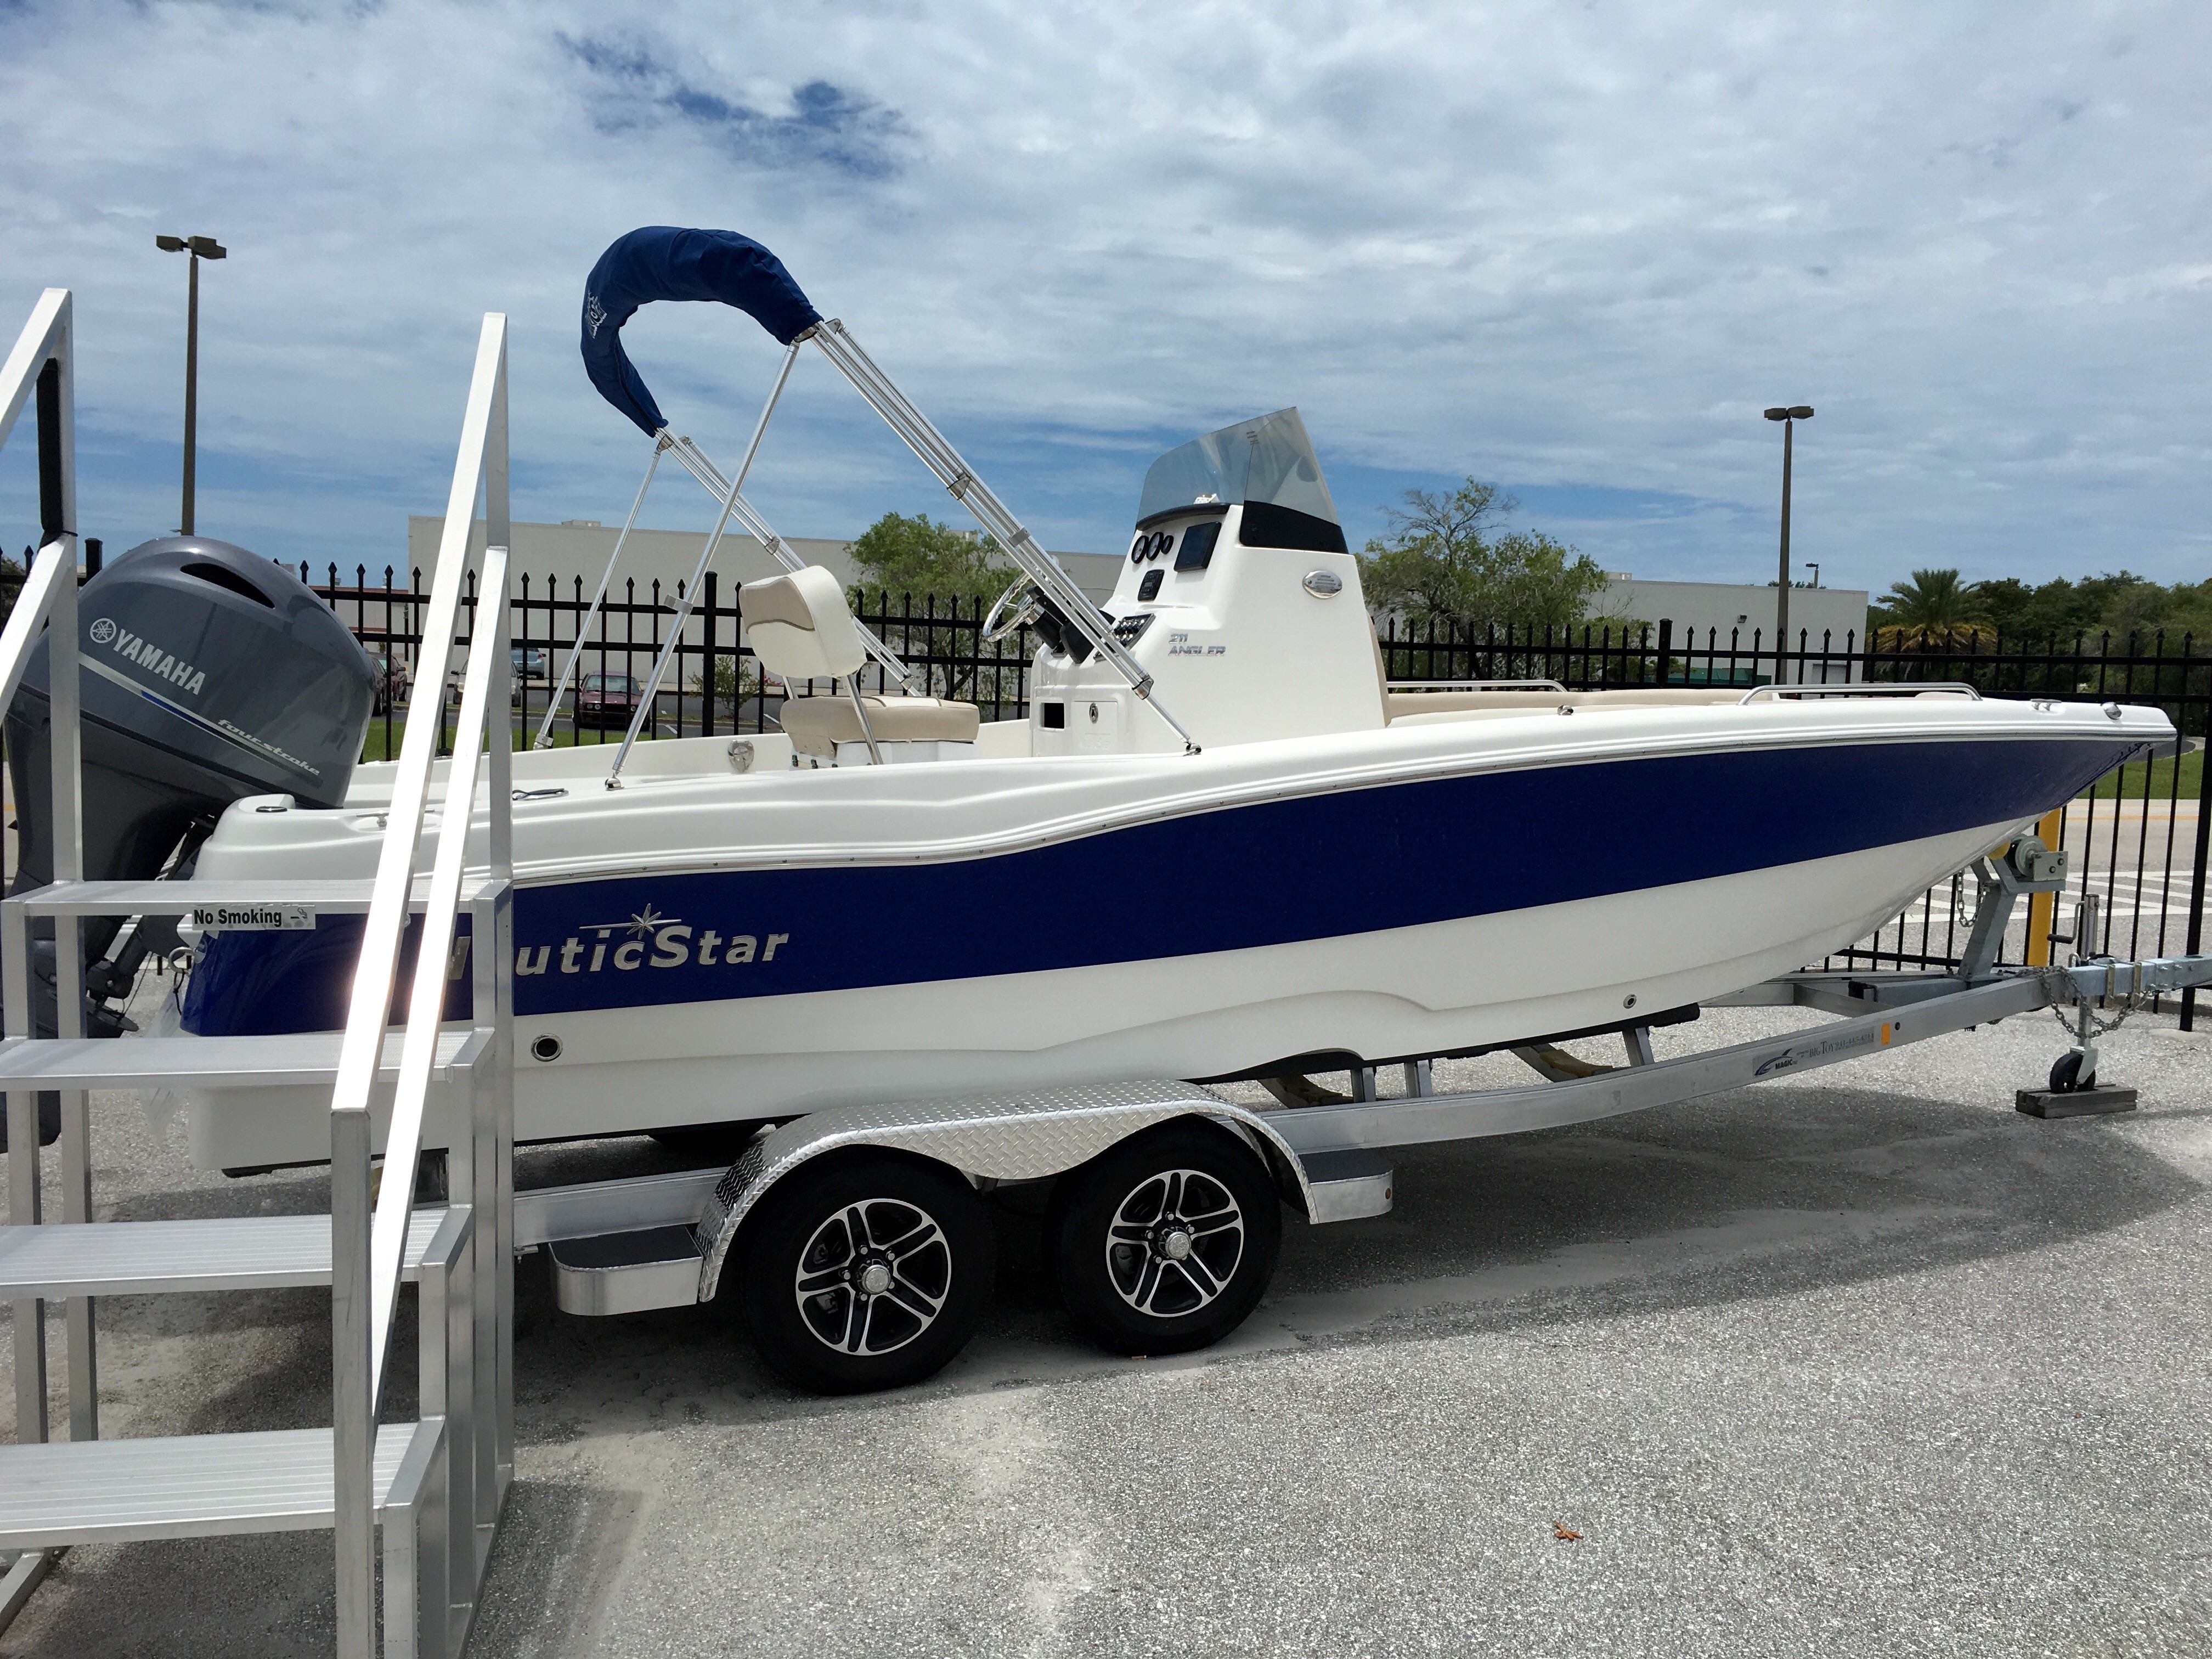 NauticStar Angler 211